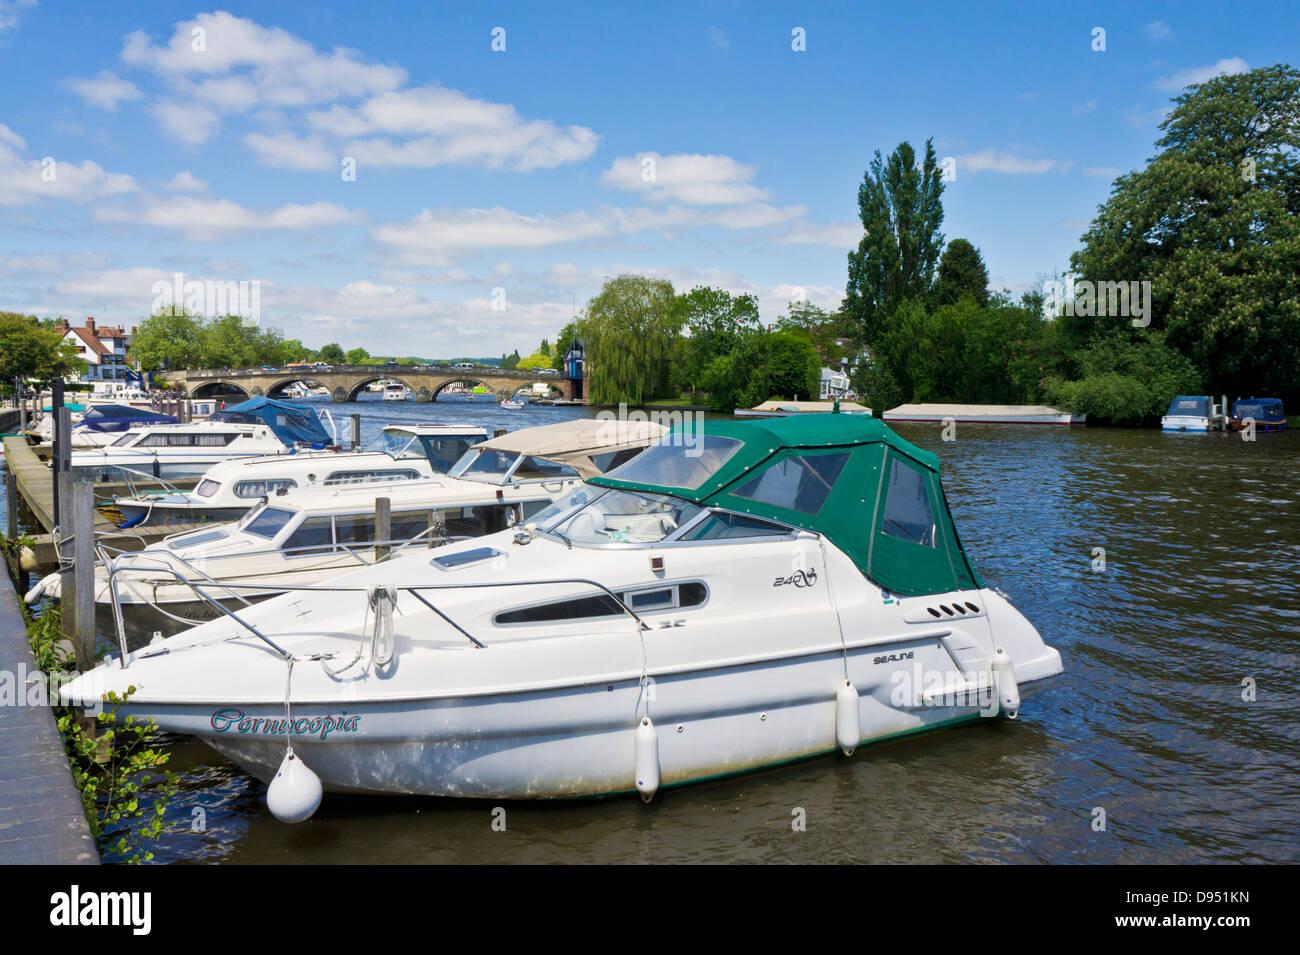 Motorboote, festgemacht an der Seite des Flusses Themse in Henley Oxfordshire England UK GB EU Europa Stockbild